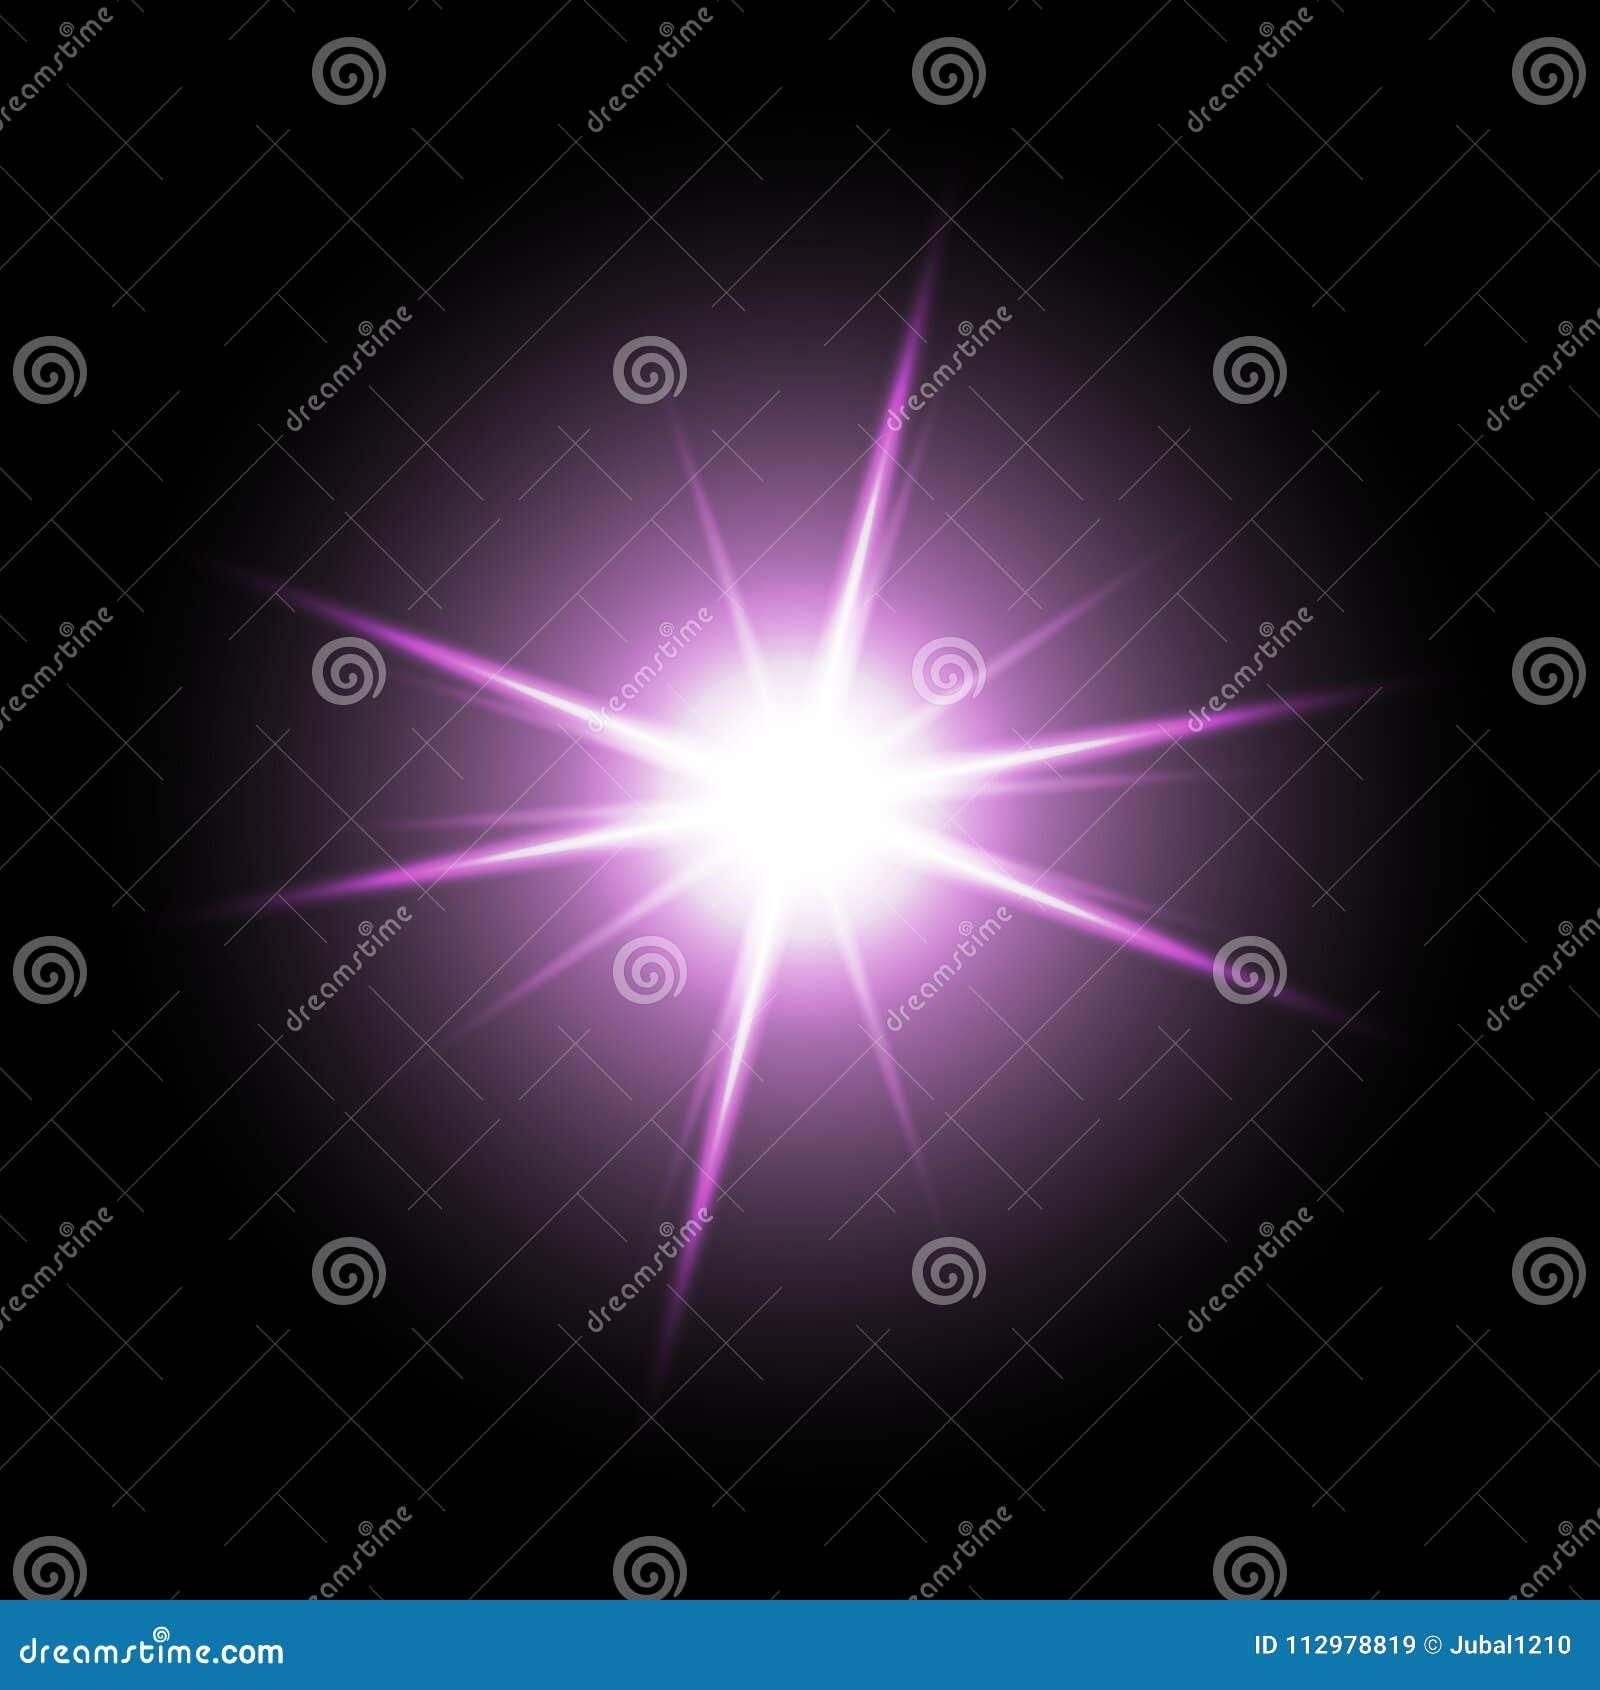 Shining star on black background, purple color